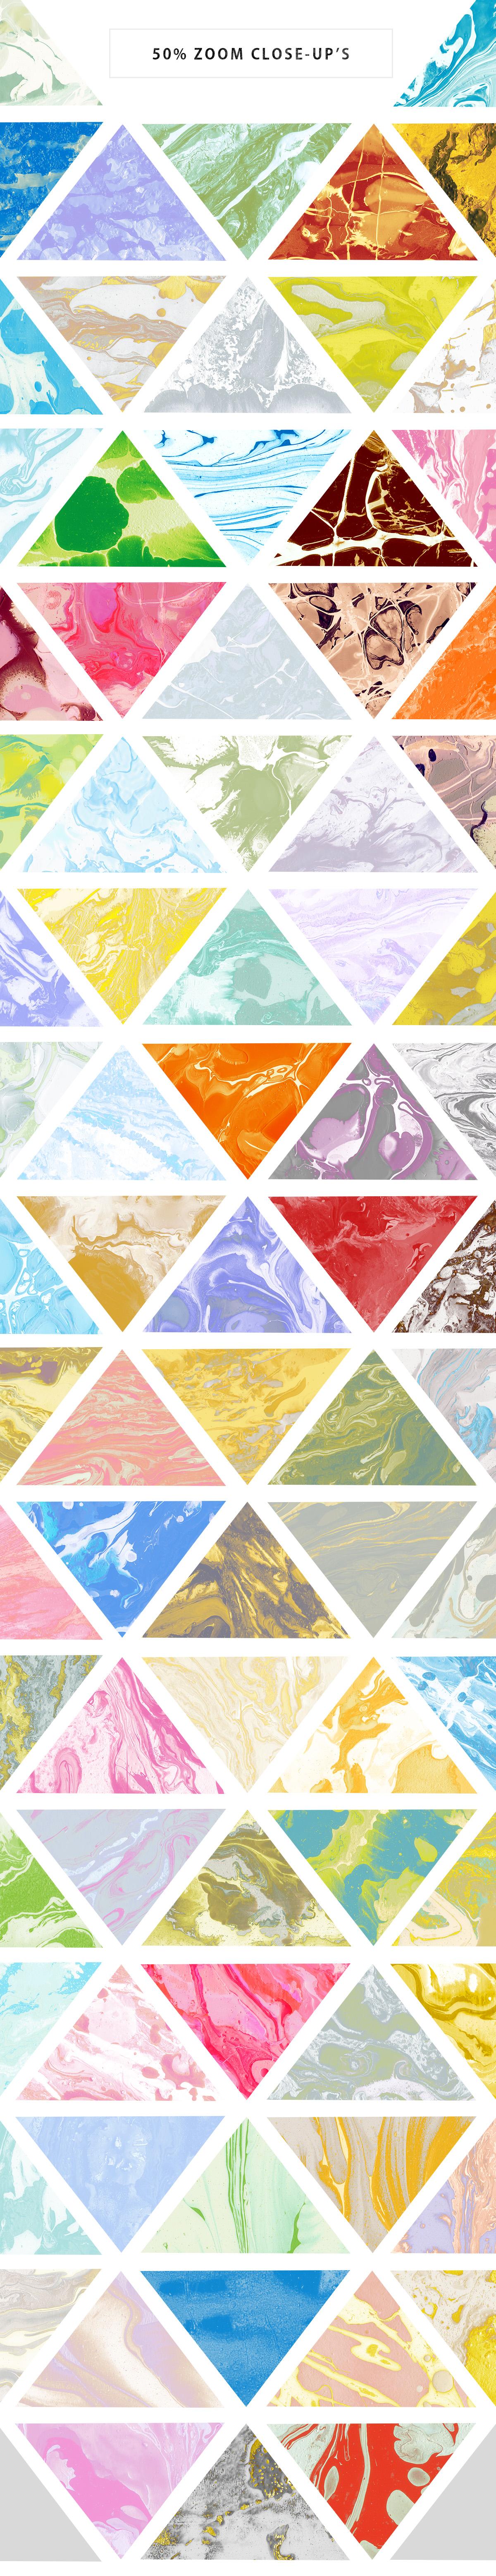 Wet Paint Textures Vol. 2 example image 9